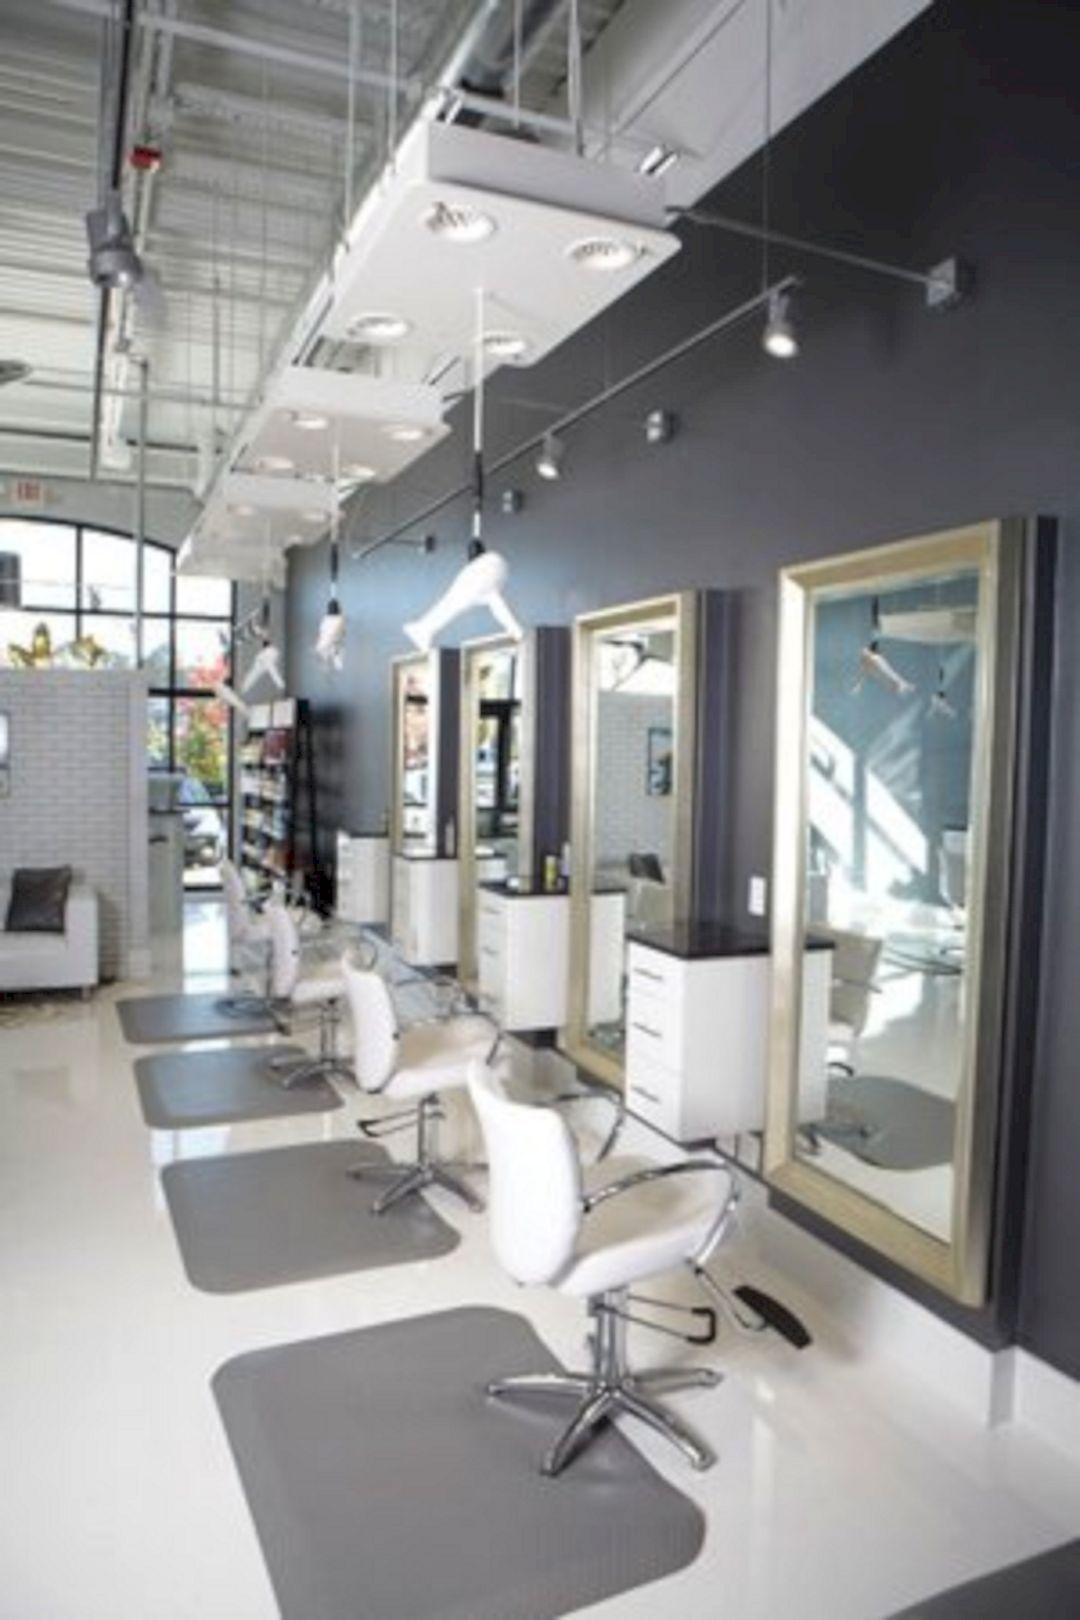 Best Home Salon Decor Ideas For Private Salon On Your Home In 2020 Salon Interior Design Home Hair Salons Salon Furniture